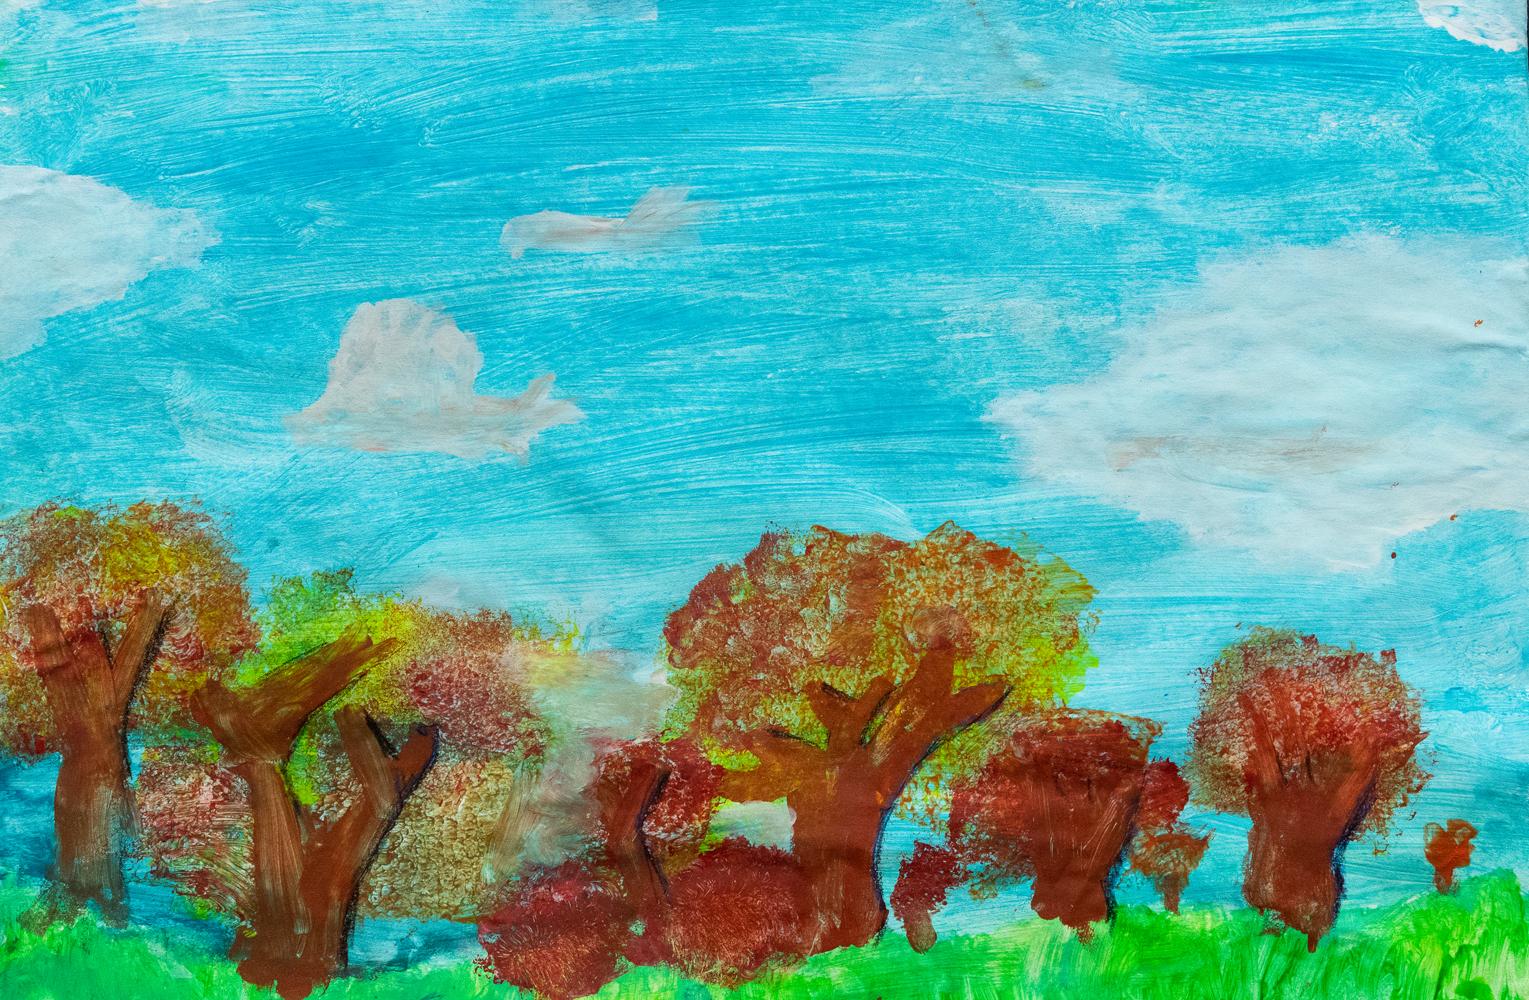 23. Kimi Jordan, 'Autumn painting', acrylic, Year 3, Chandler Public School